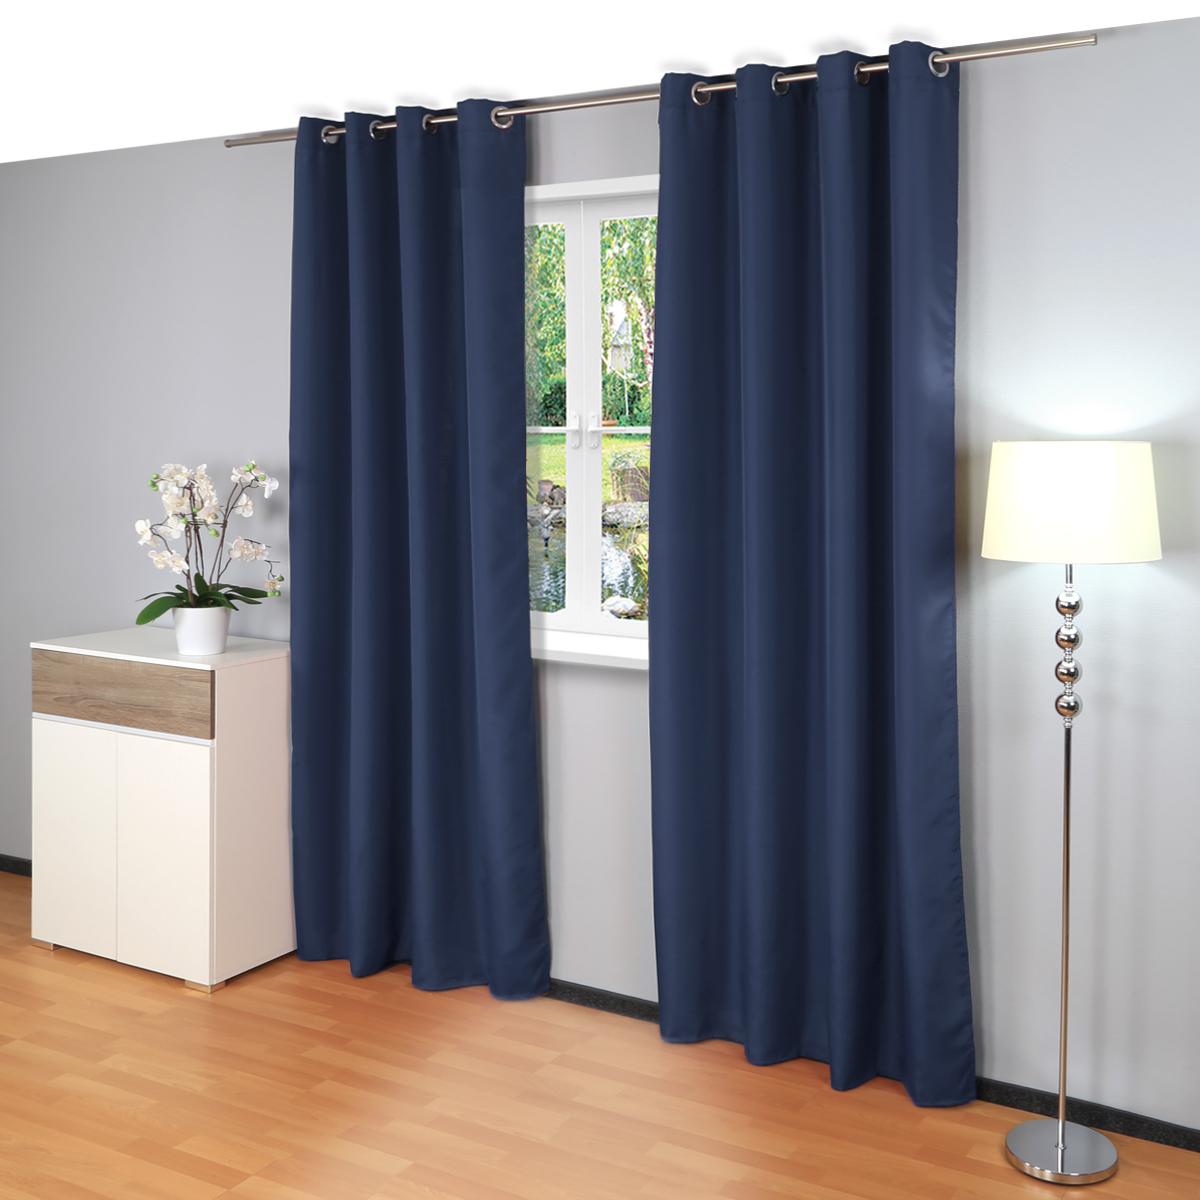 senvorhang ocean vorhang gardine senschal 140x245cm thermo blickdicht ebay. Black Bedroom Furniture Sets. Home Design Ideas